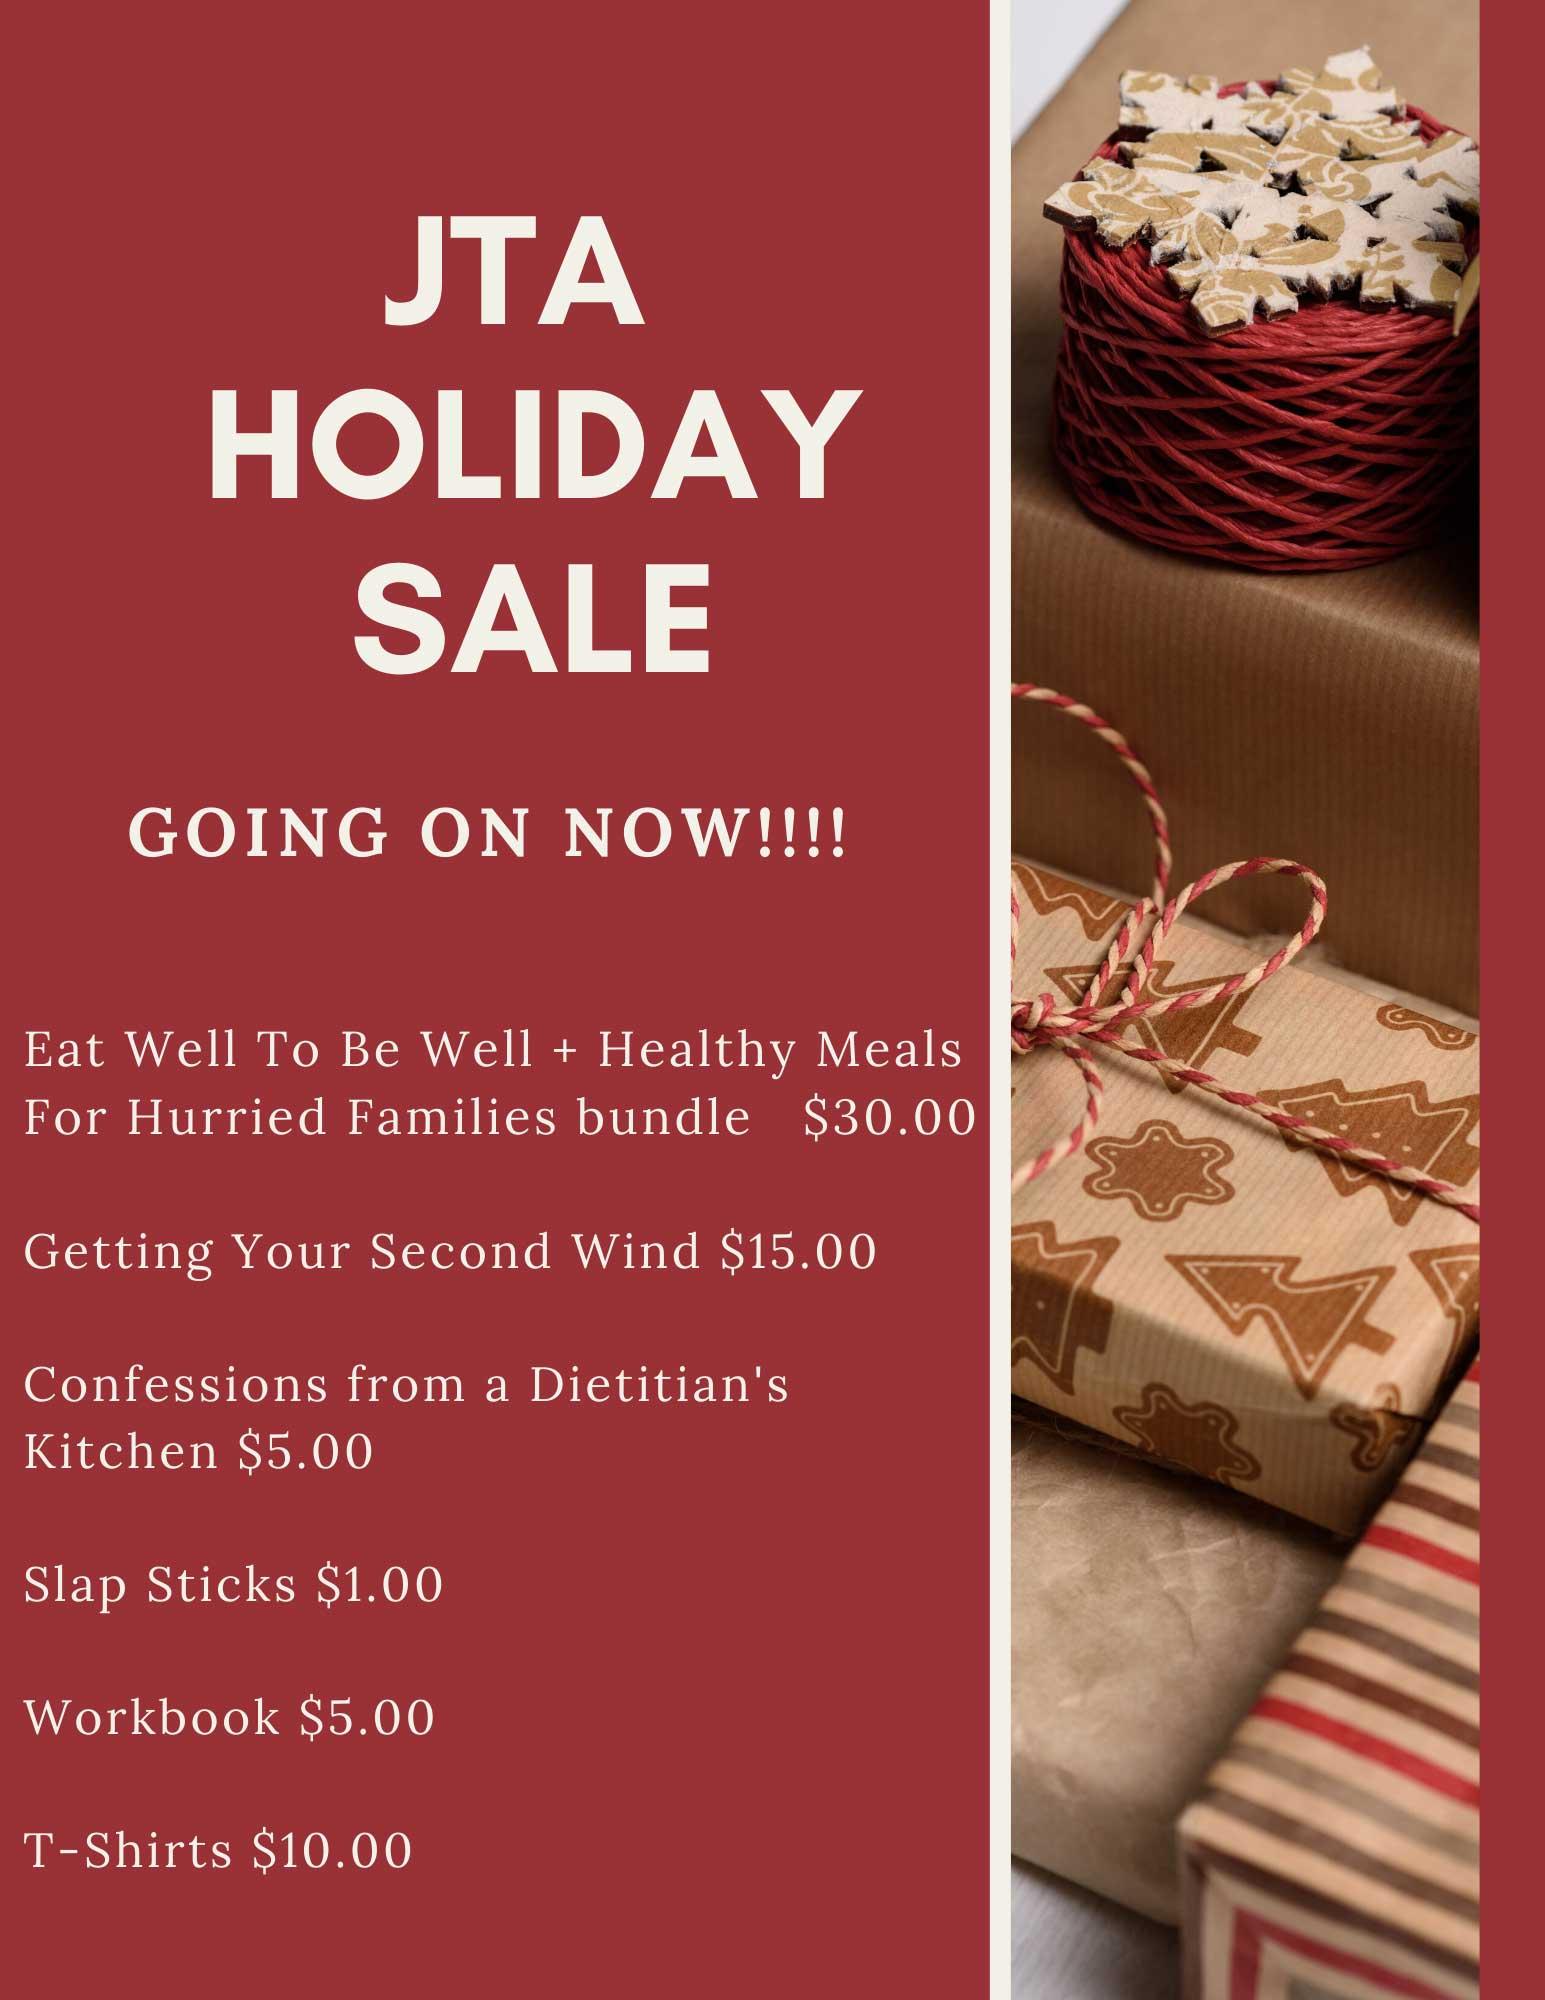 JTA Holiday Sale